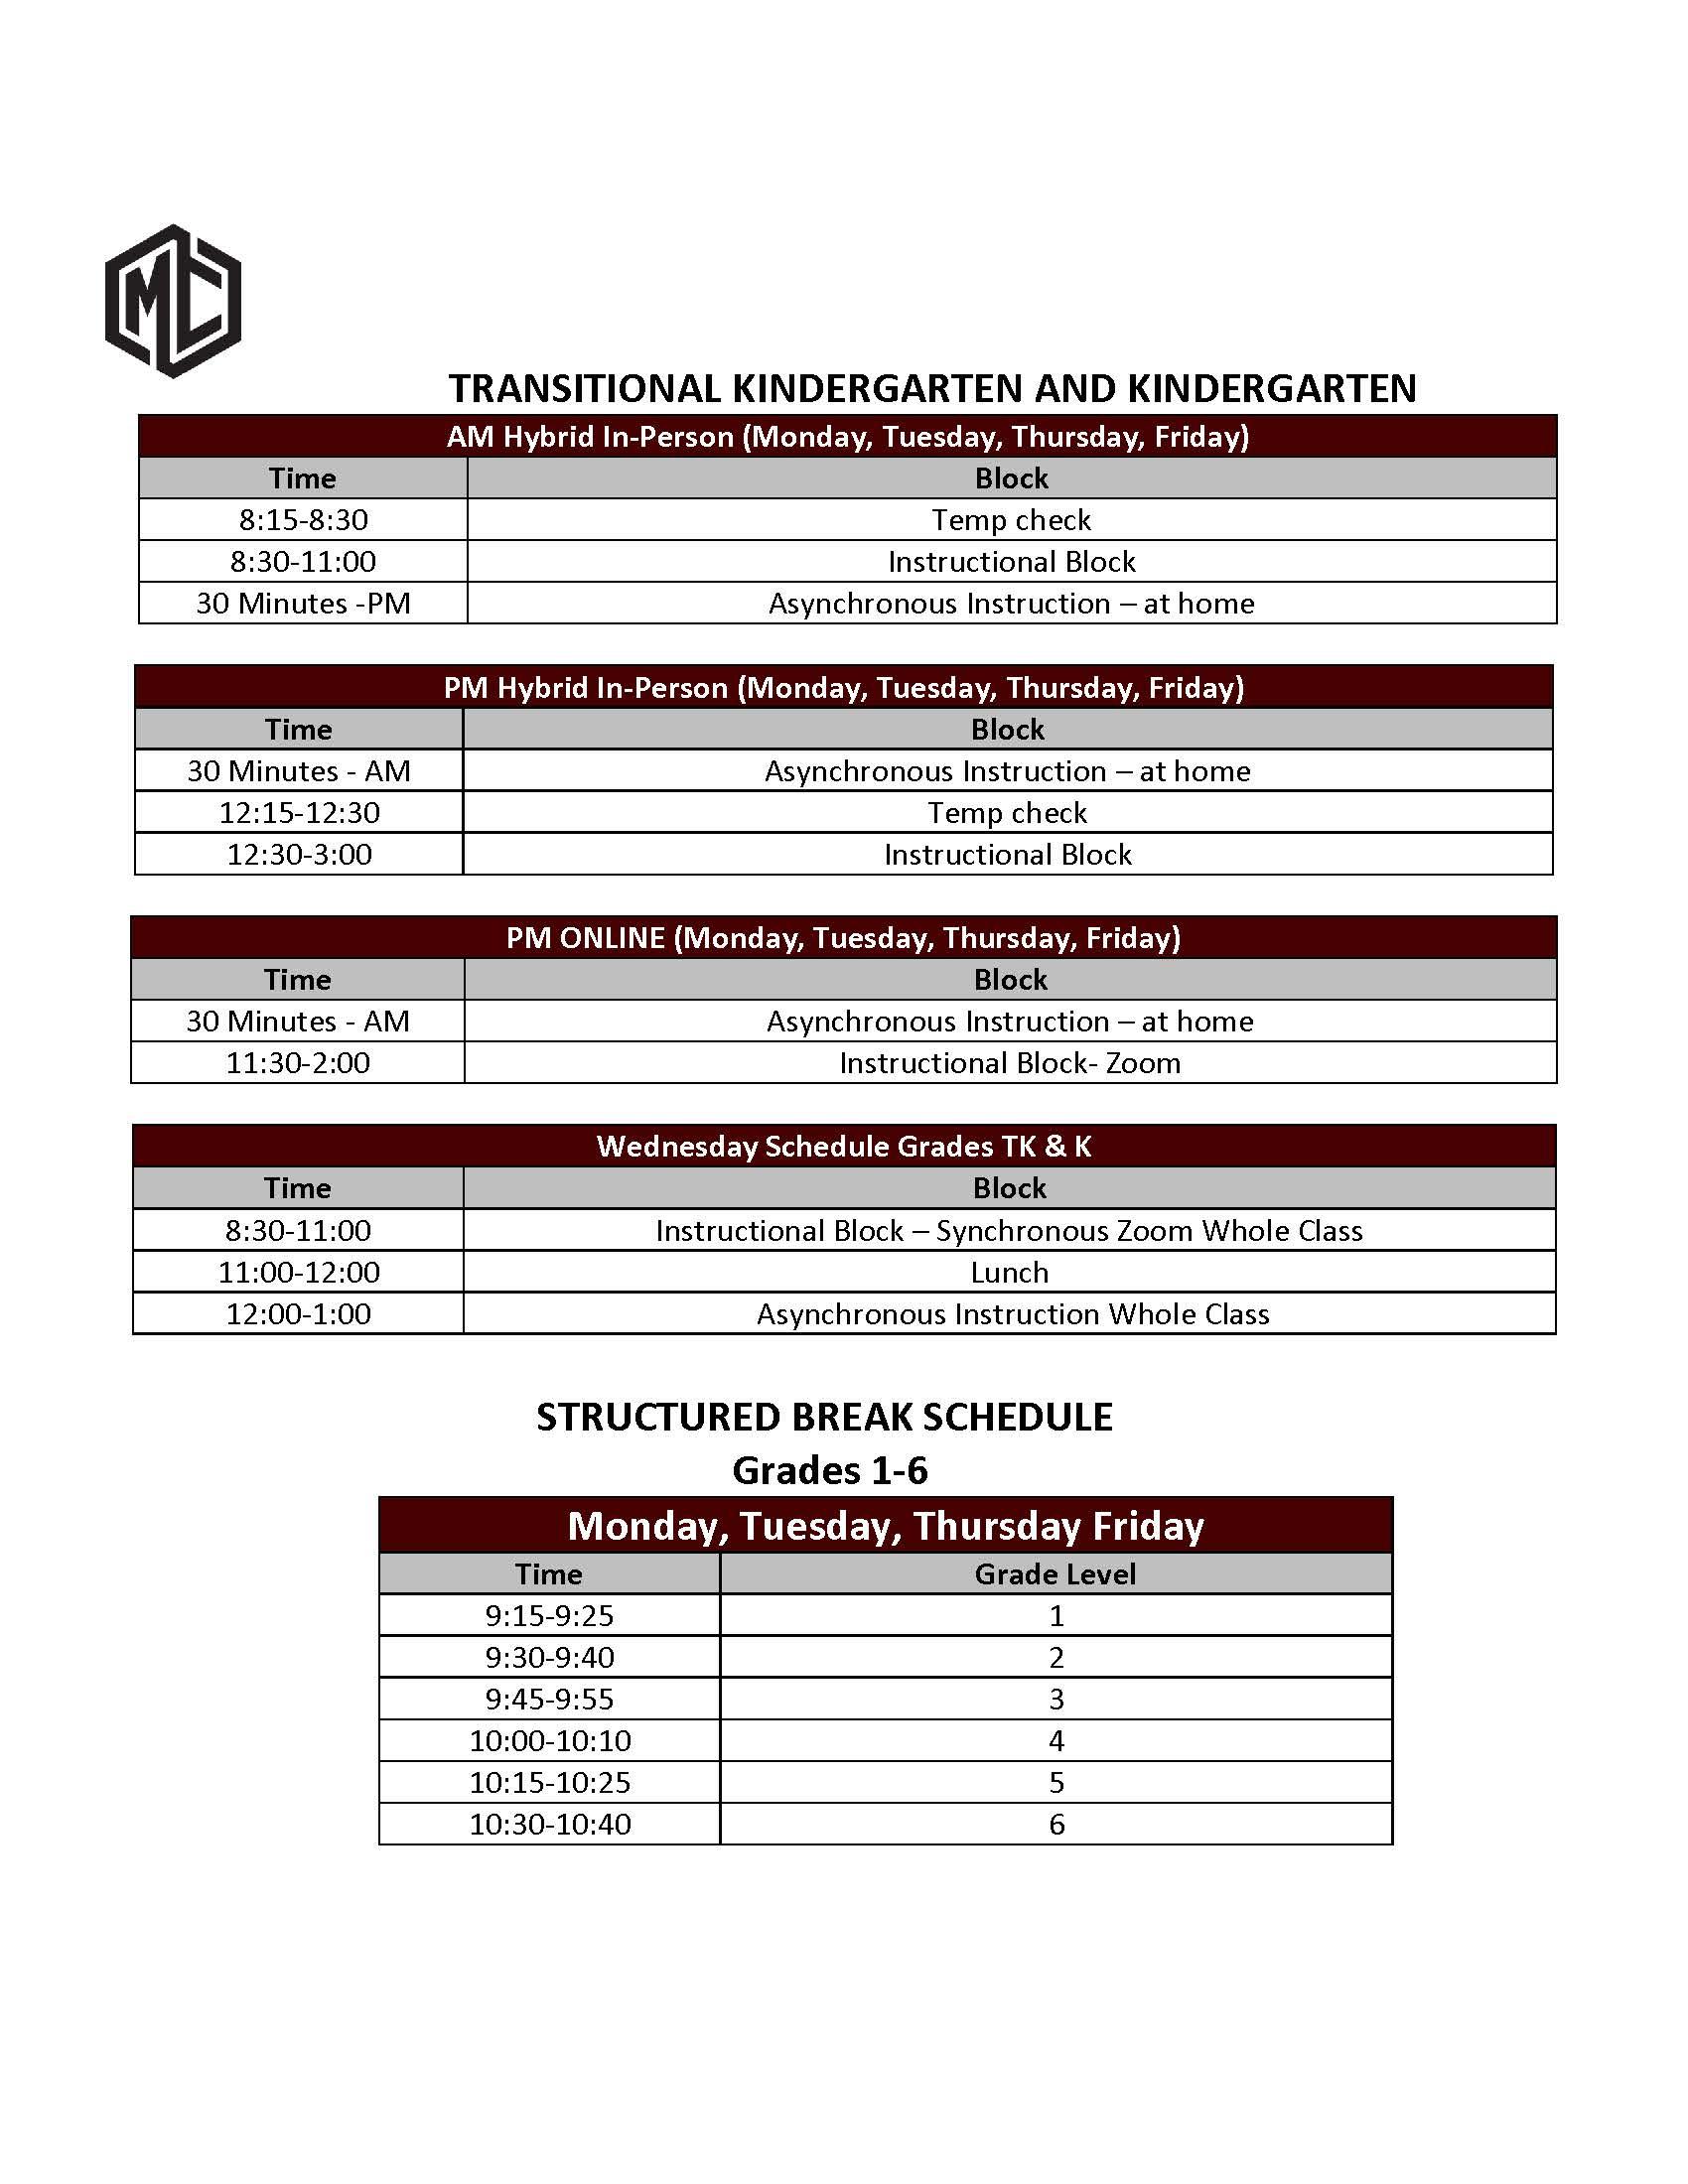 Kinder Bell schedule